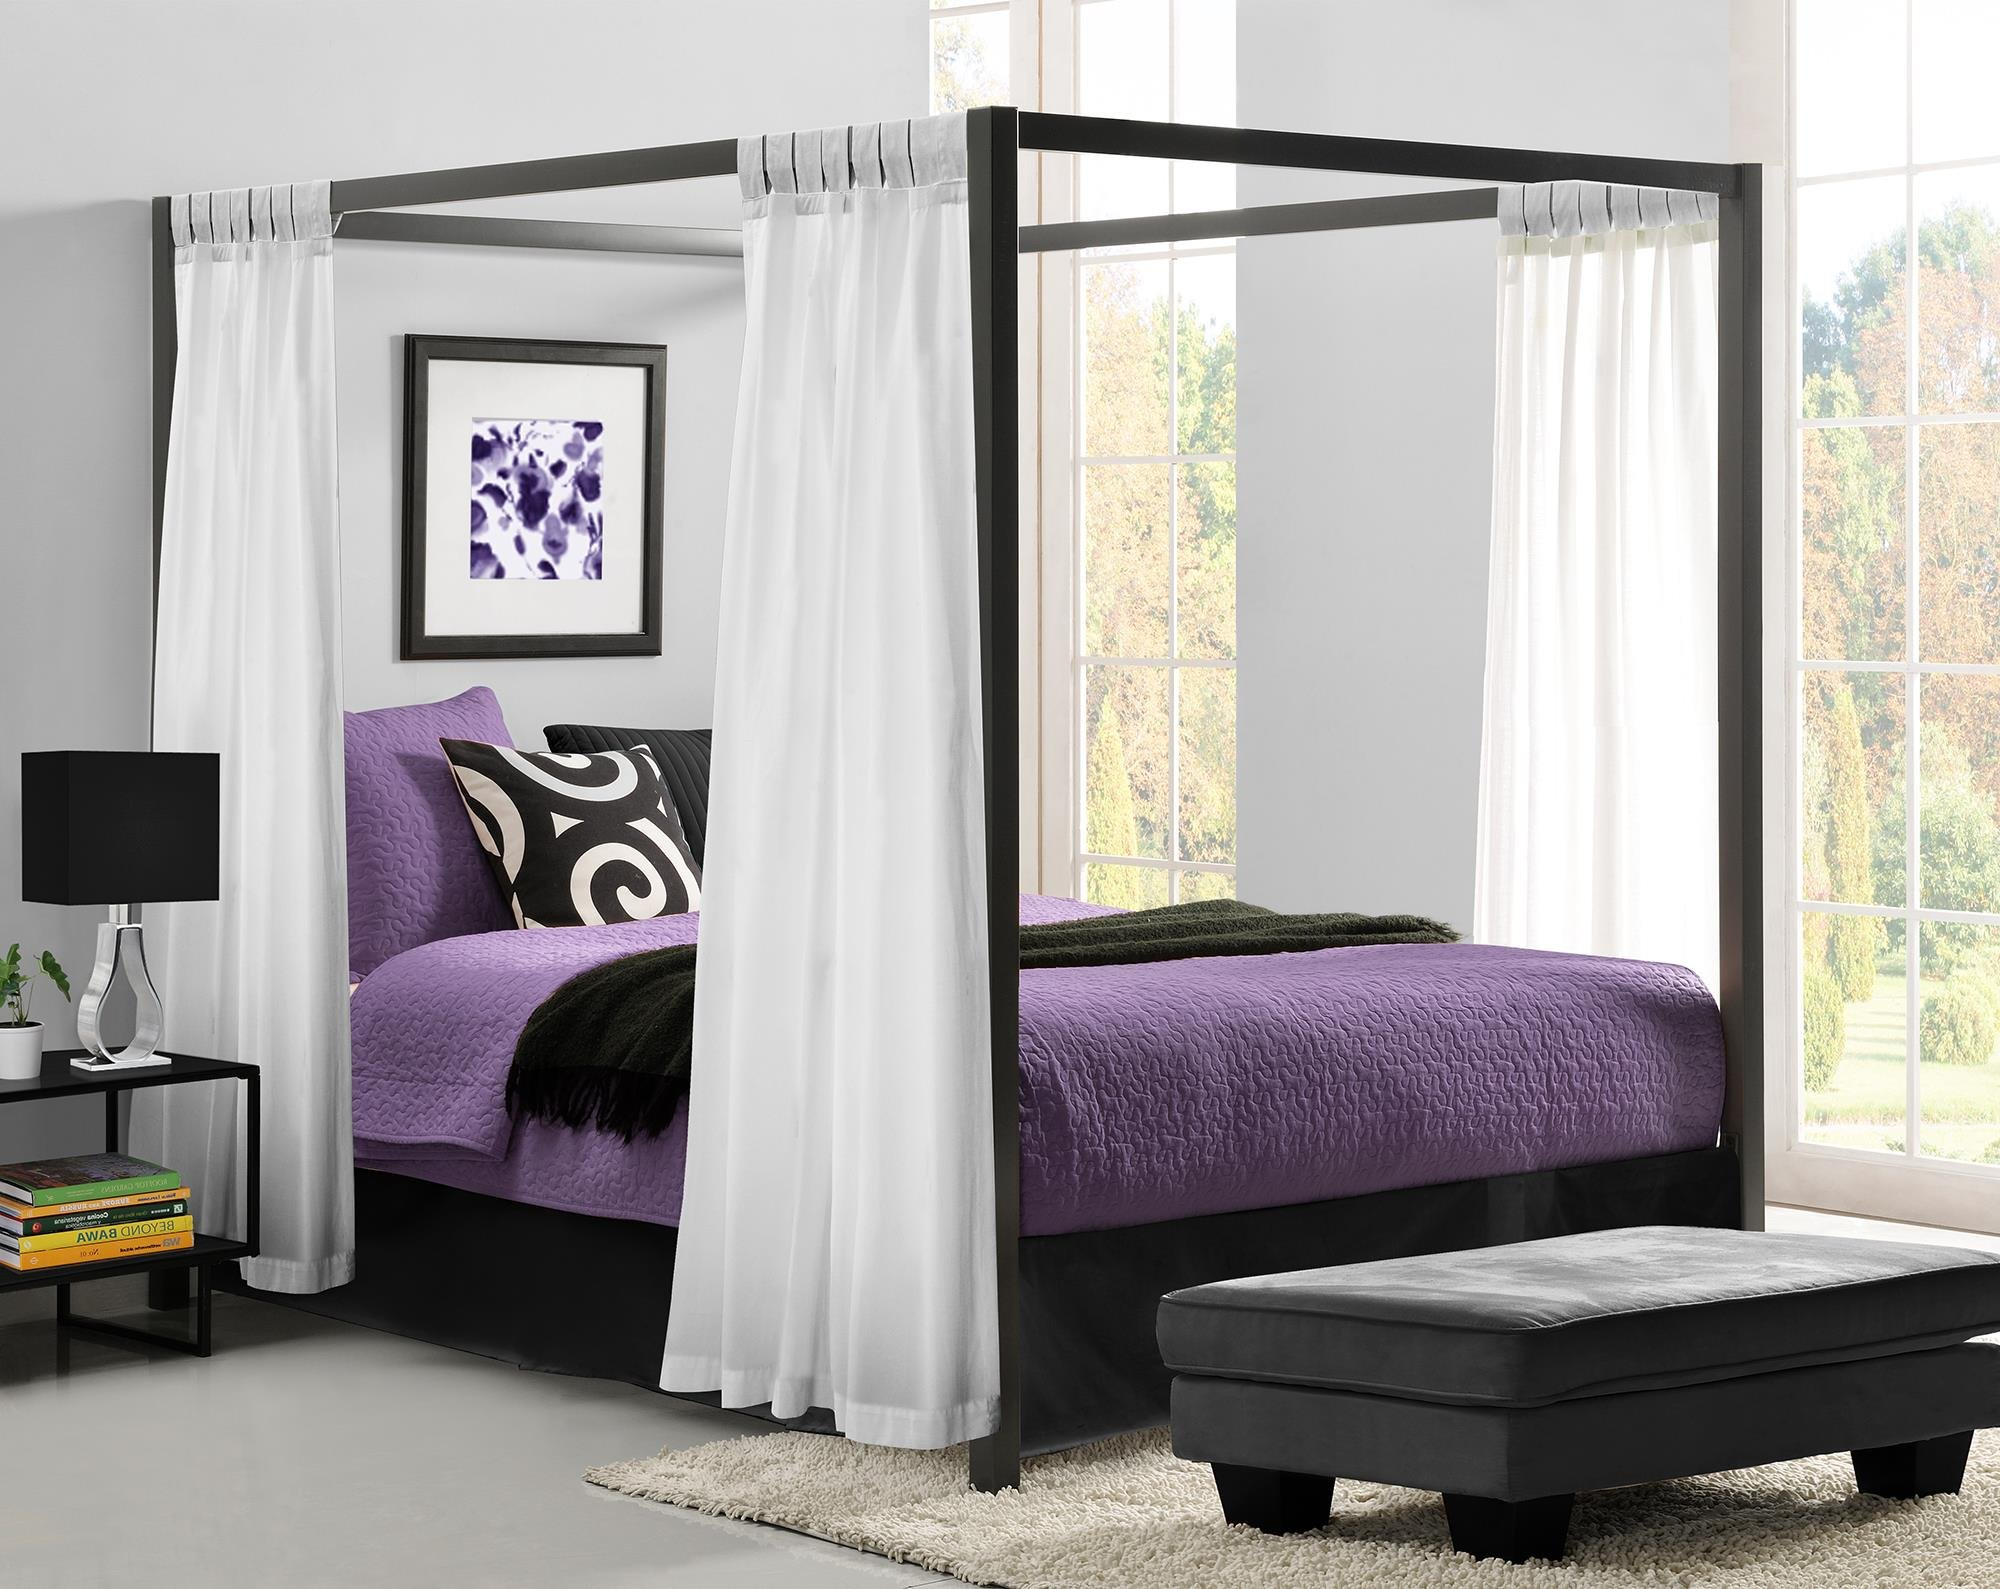 Dhp Modern Metal Framed Industrial Canopy Bed Frame Queen